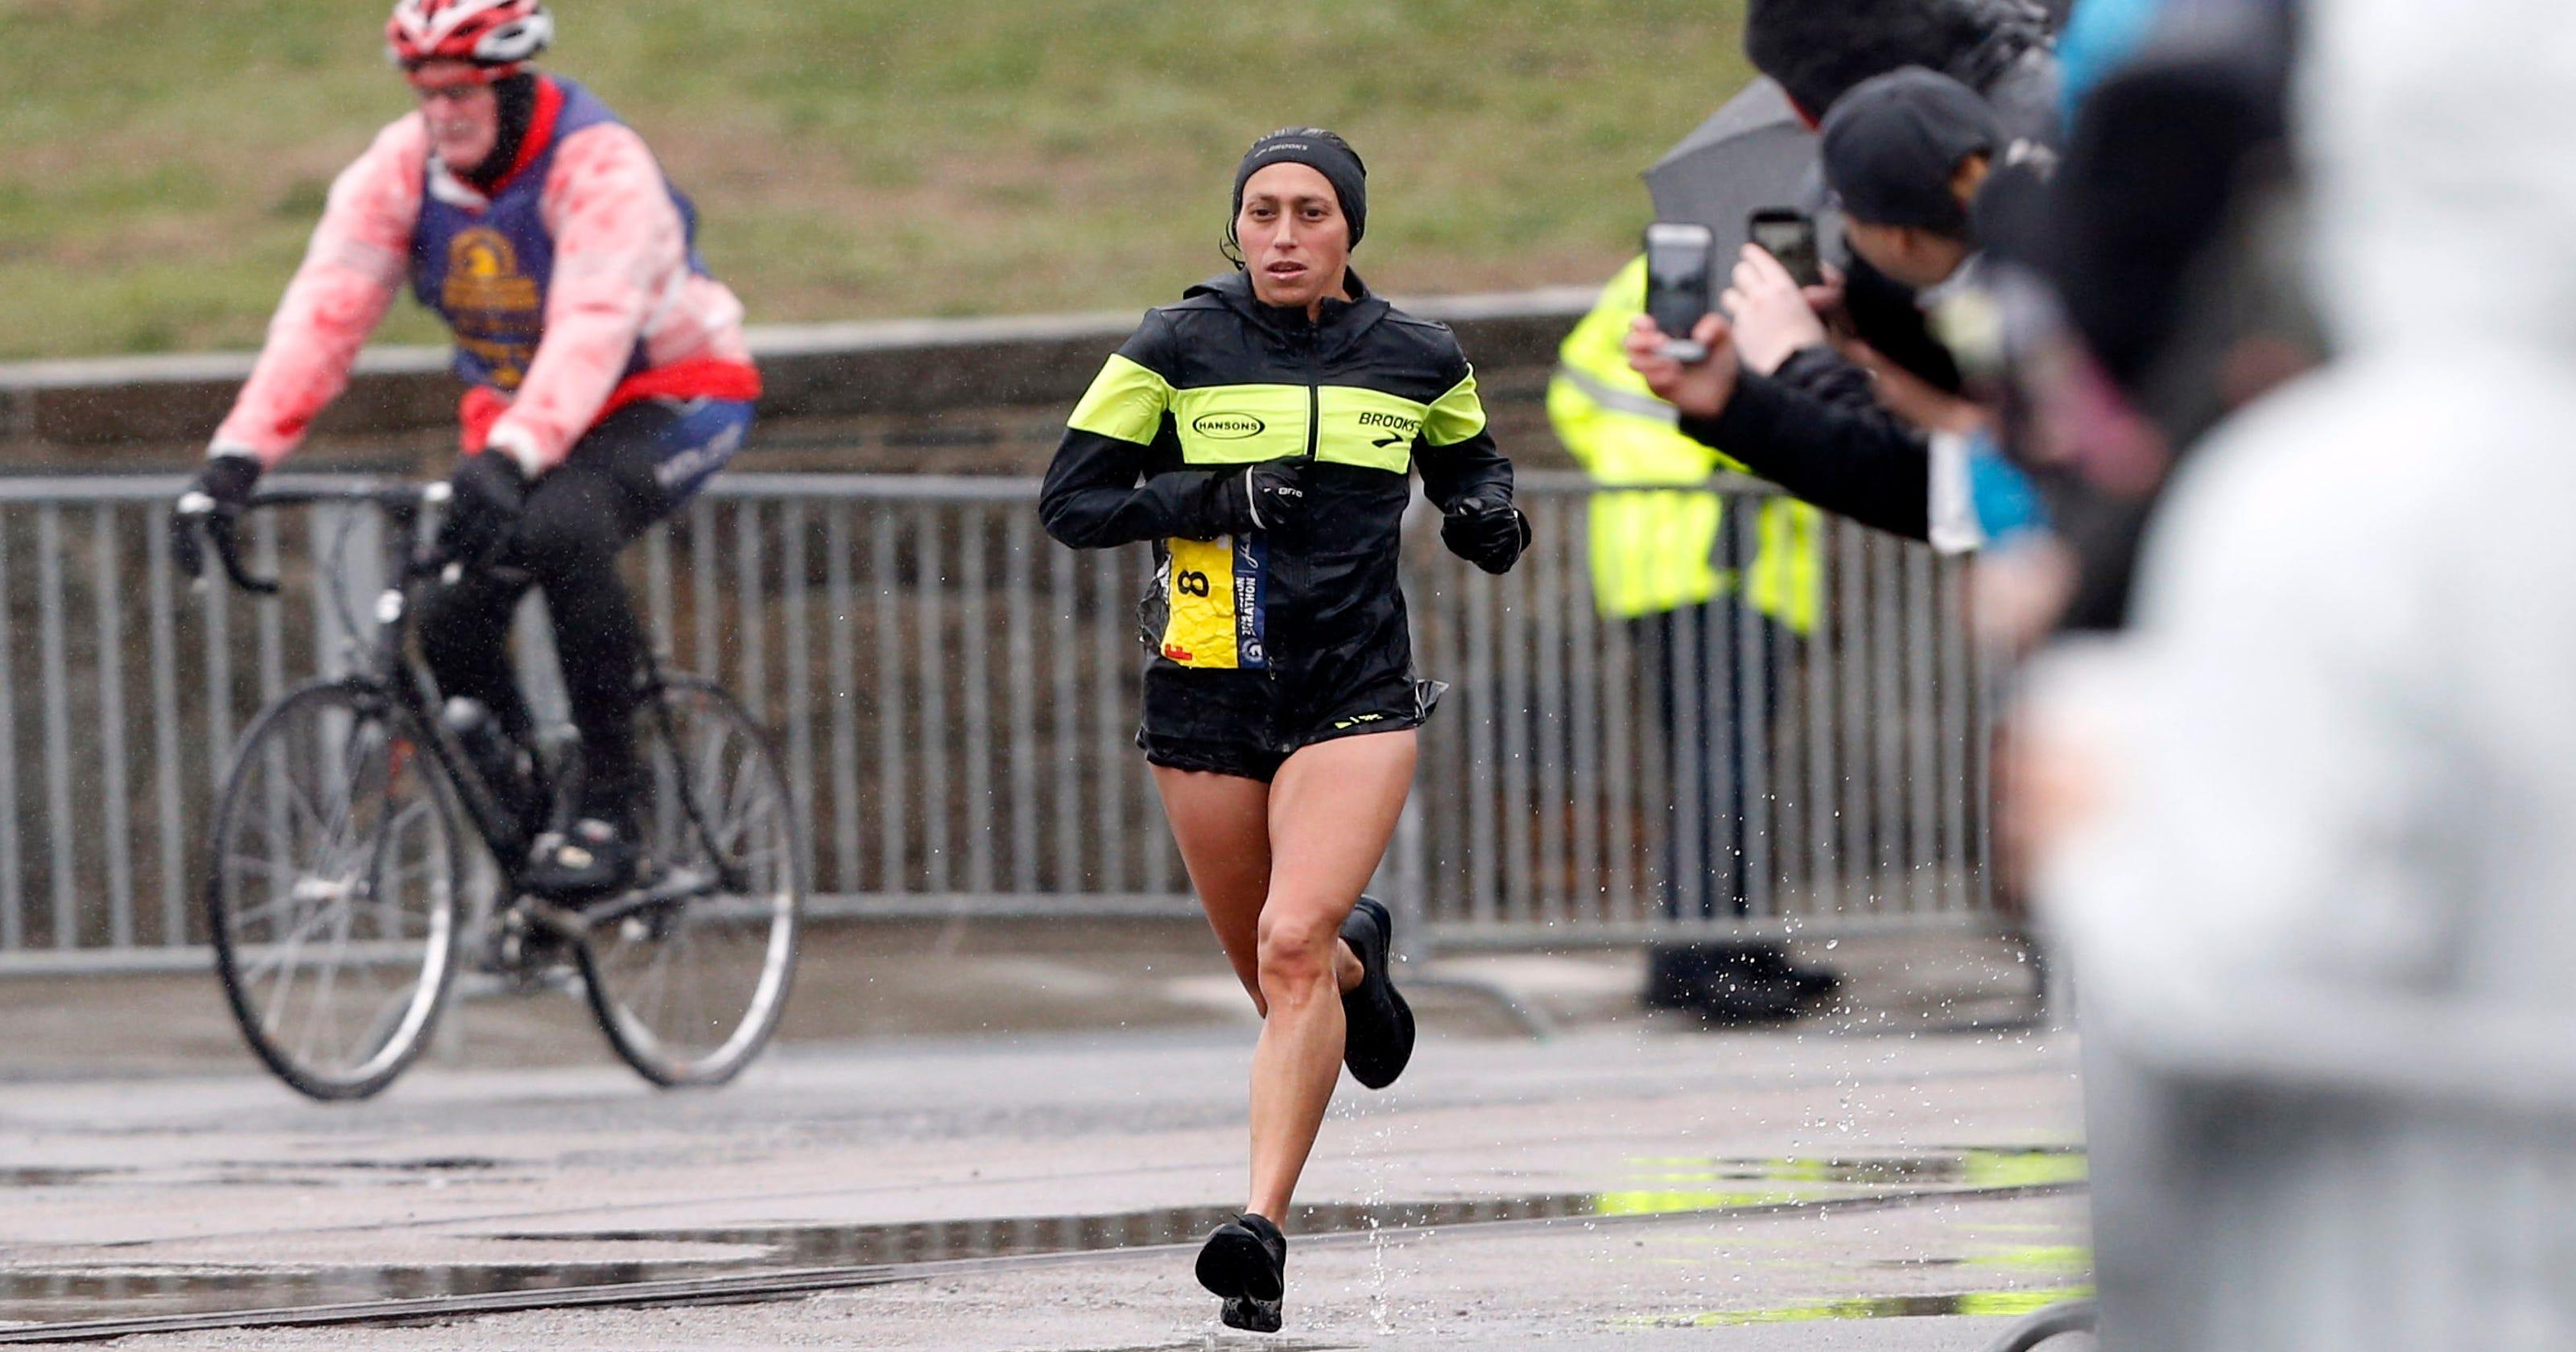 a429b29328e Boston Marathon  Desi Linden shows incredible sportsmanship in winning